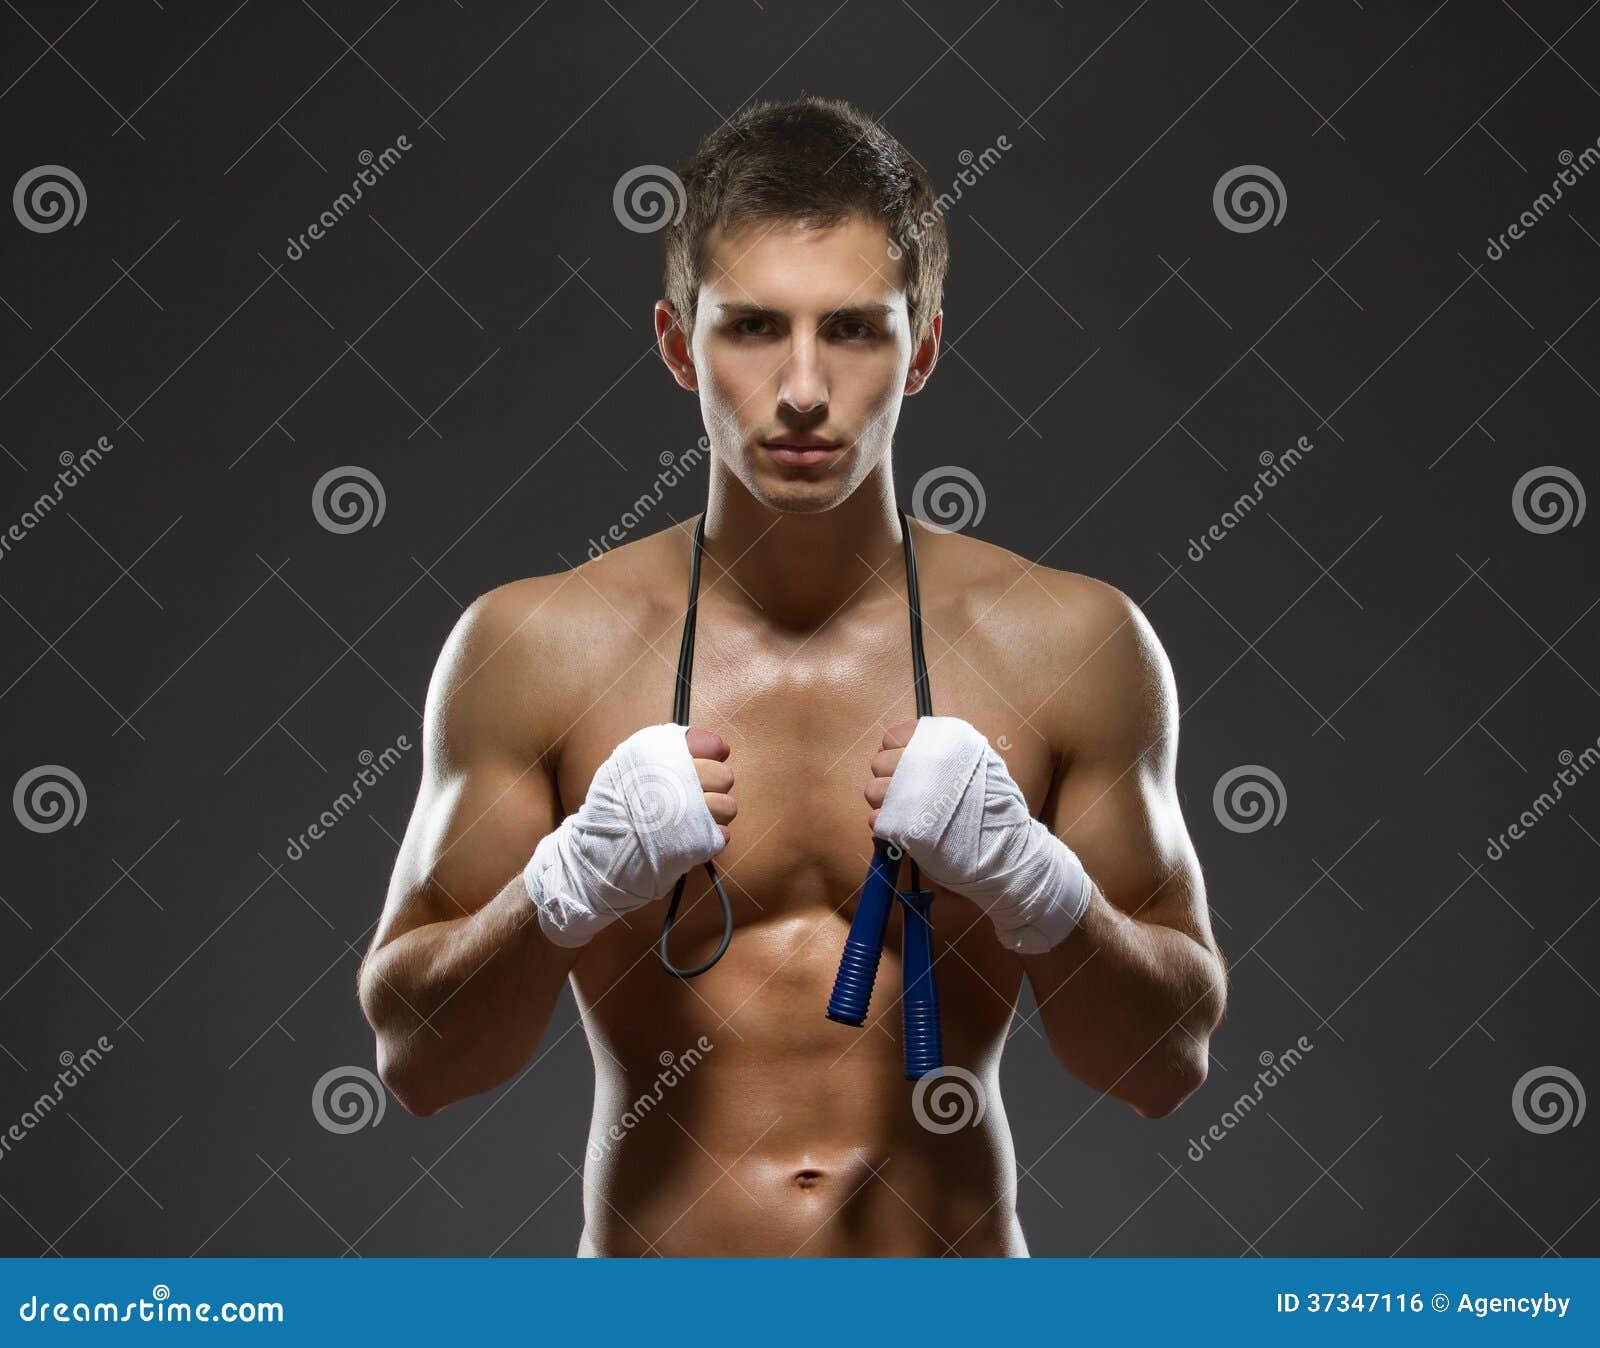 I halvfigur stående av den sexiga idrottsmannen